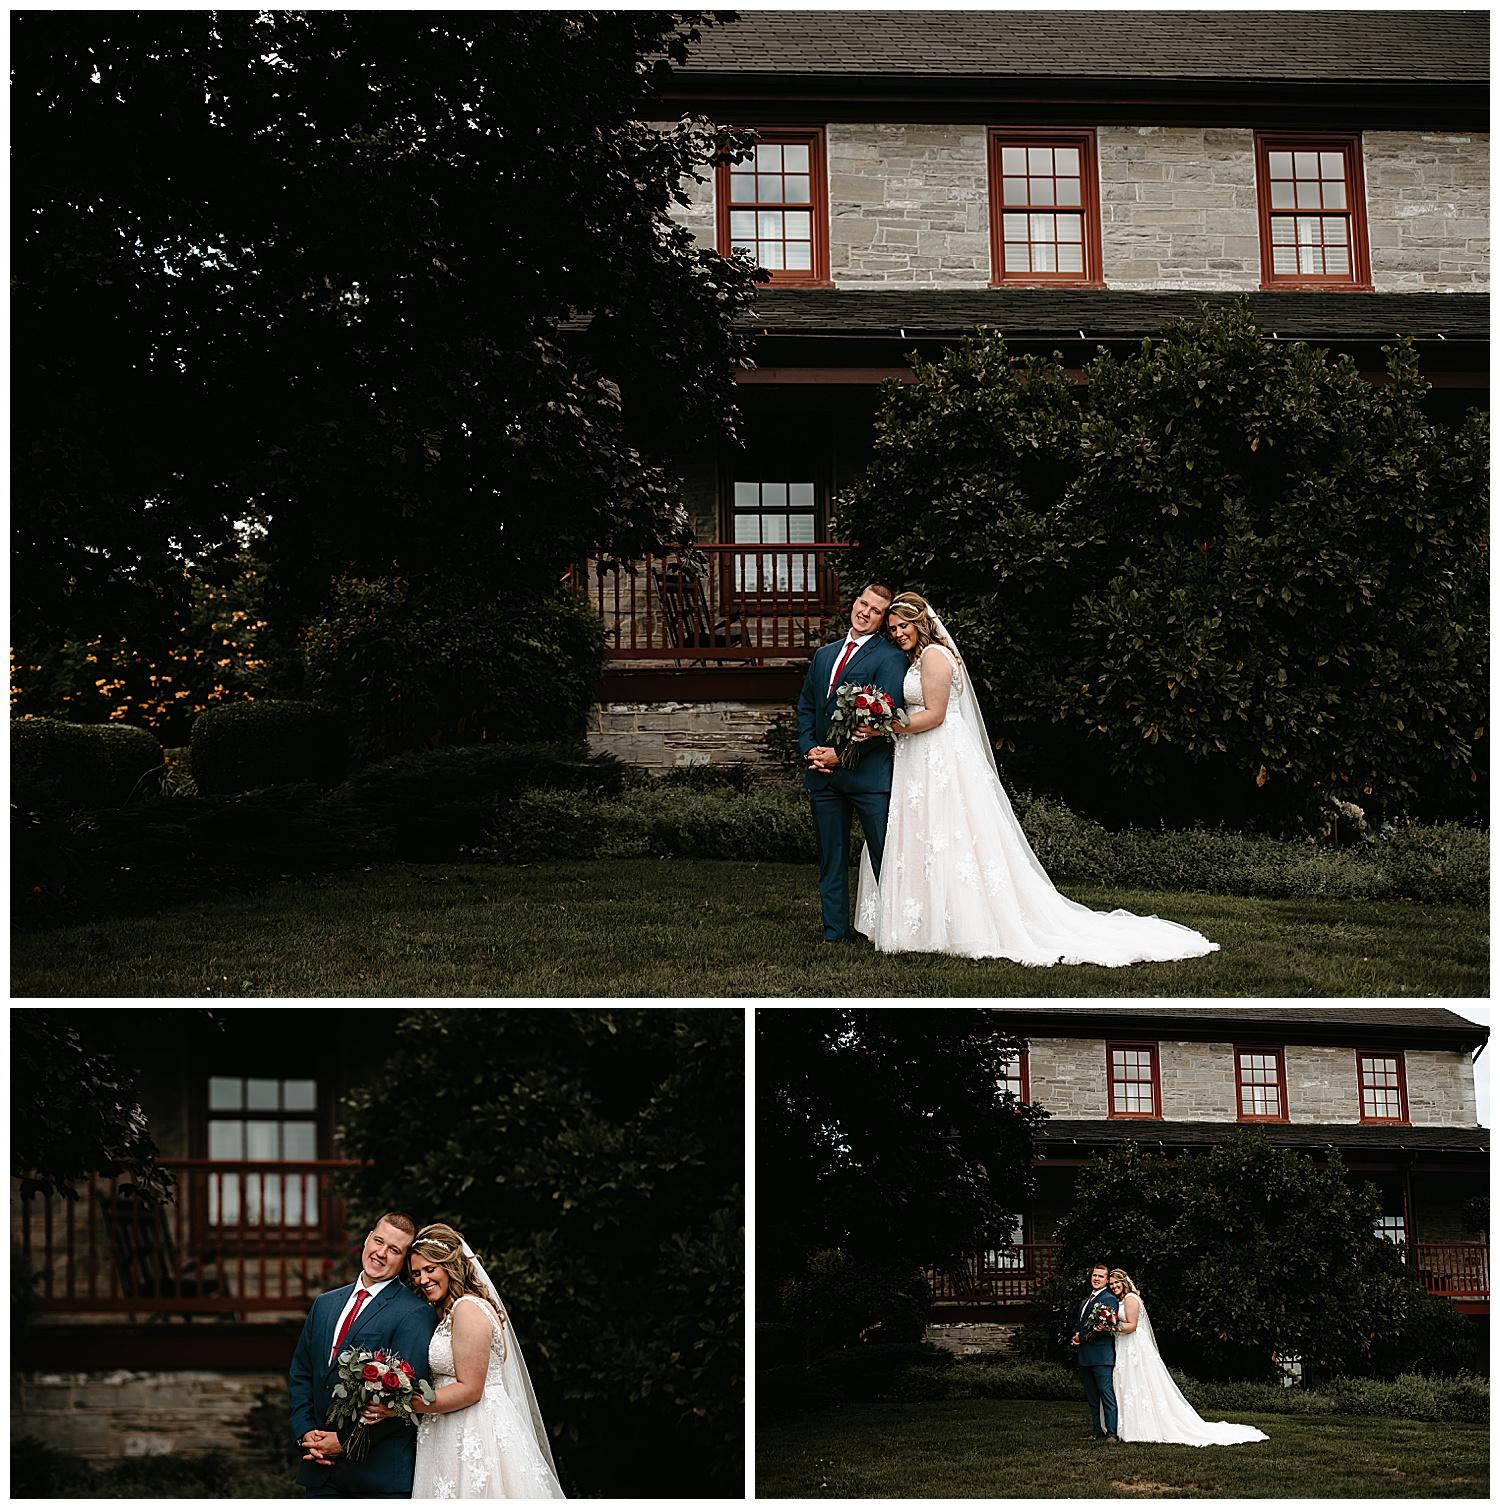 NEPA-Bloomgsburg-Wedding-Photographer-at-The-Barn-at-Greystone-Farms-Watsontown-PA_0028.jpg